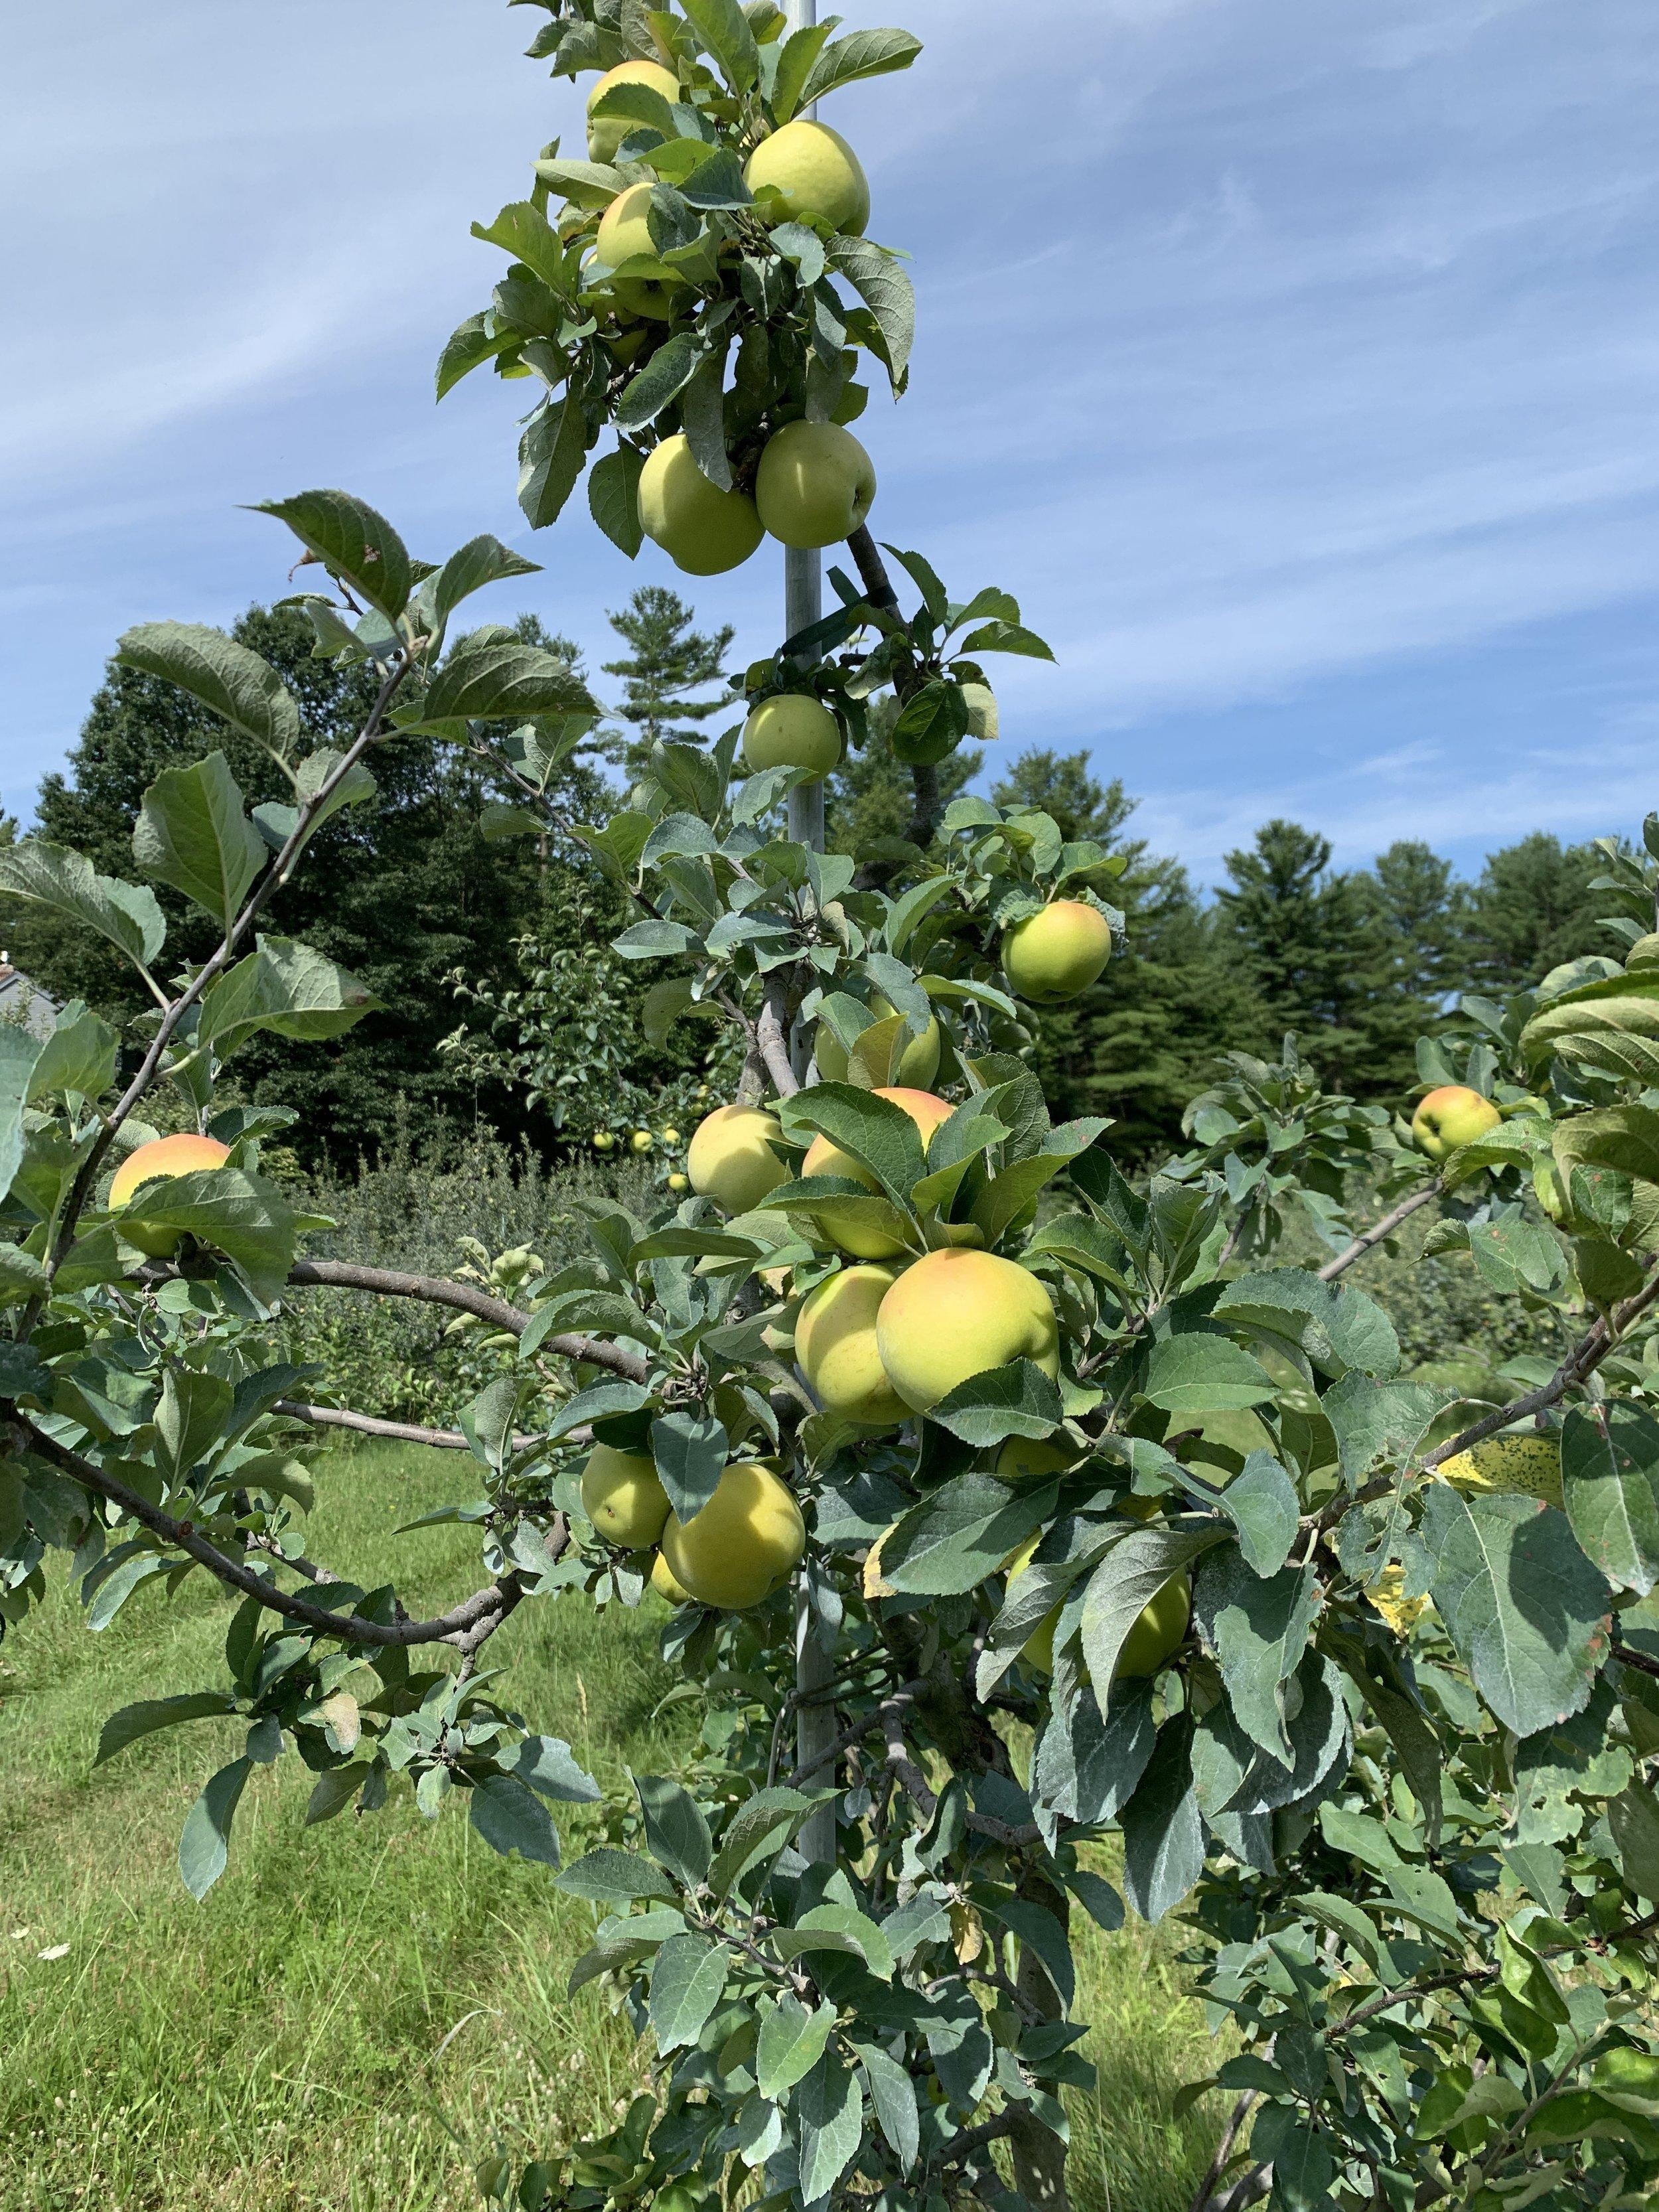 Pristine Apples, August 1, 2019